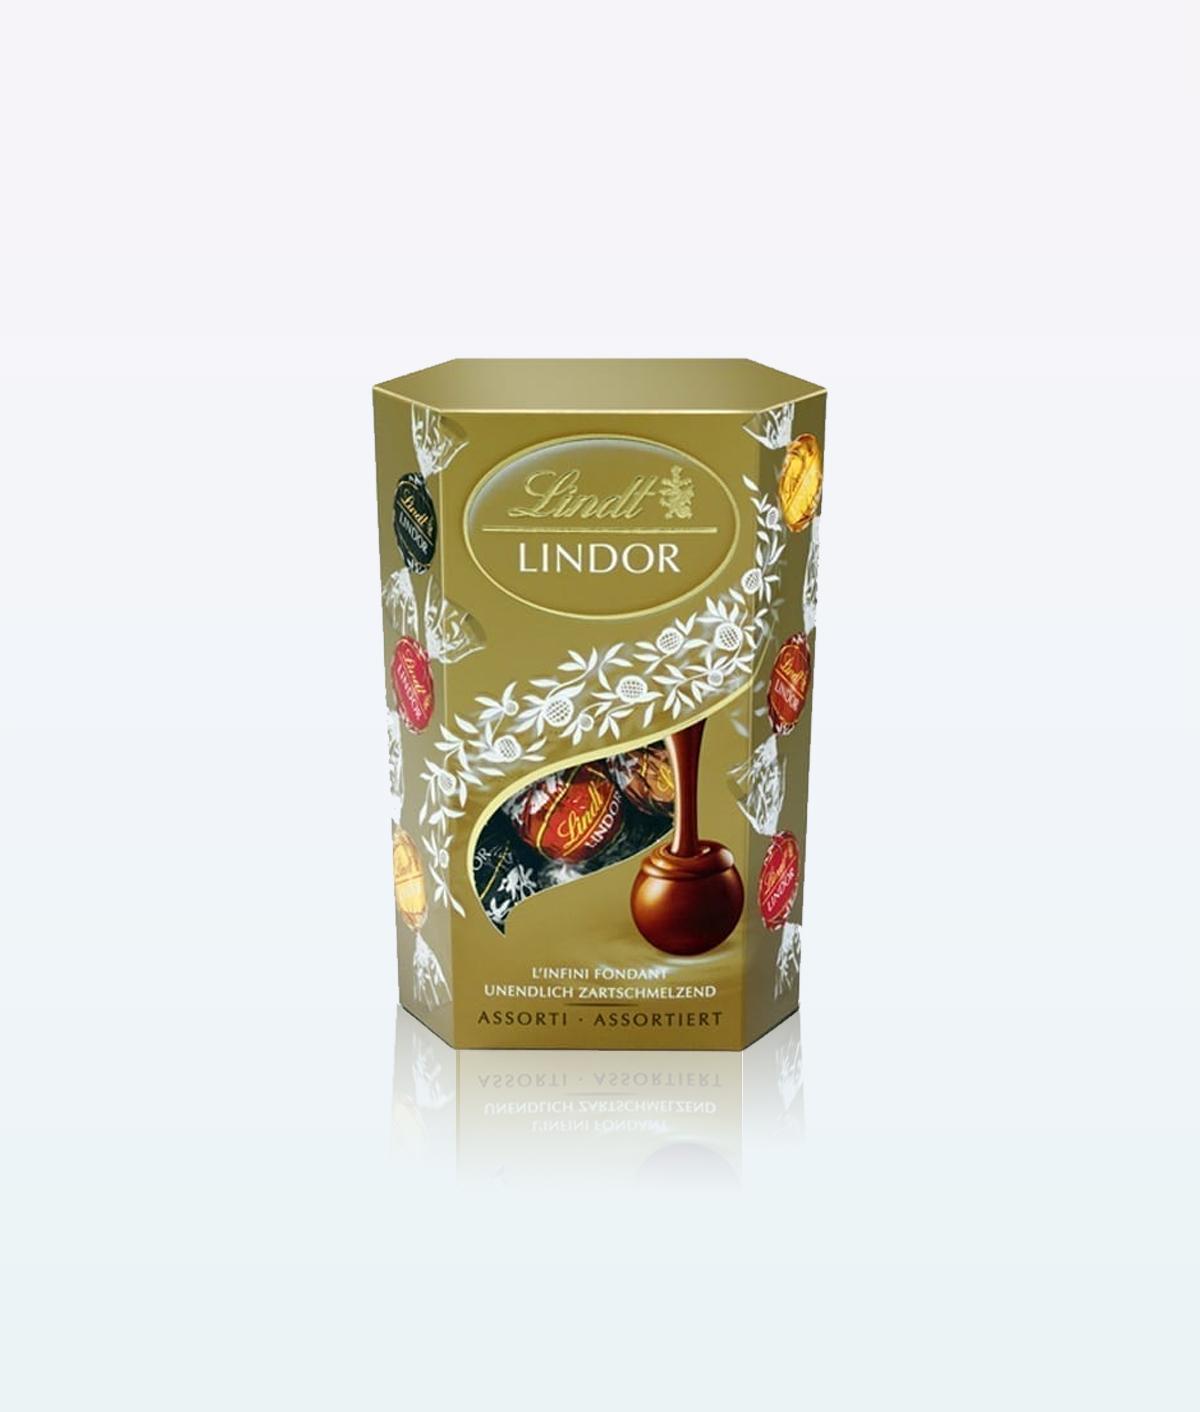 Lindor-Assortment-Chocolate-Cornet-ball